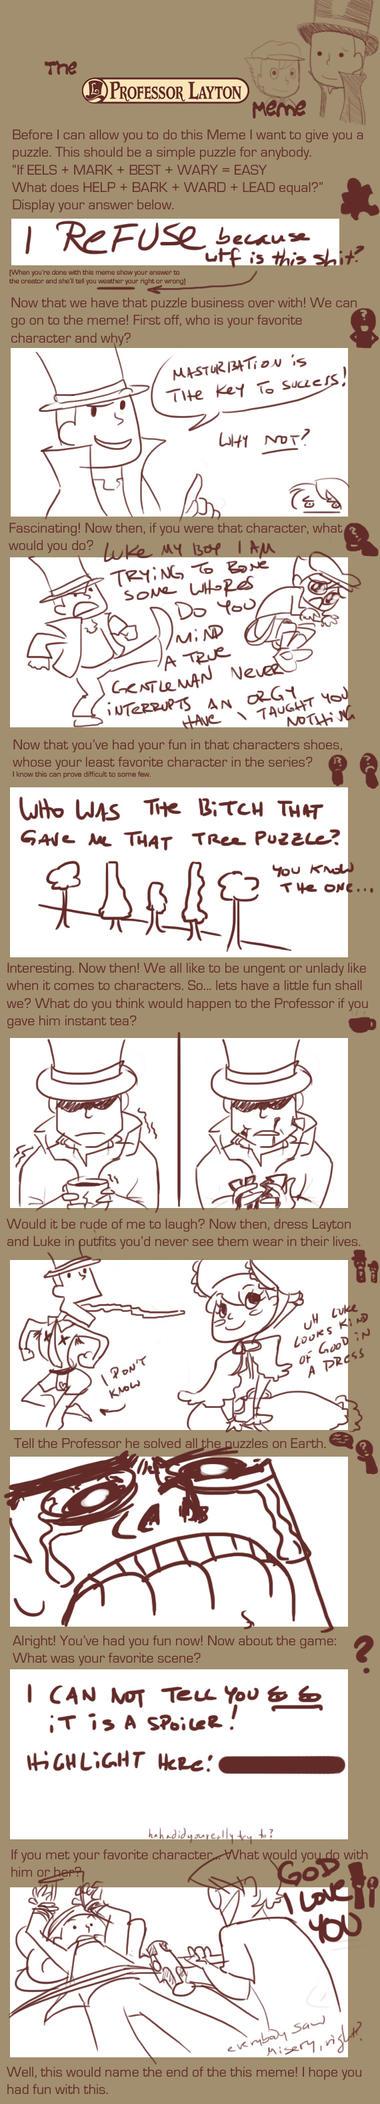 Professor Layton and the Twit by Navedium